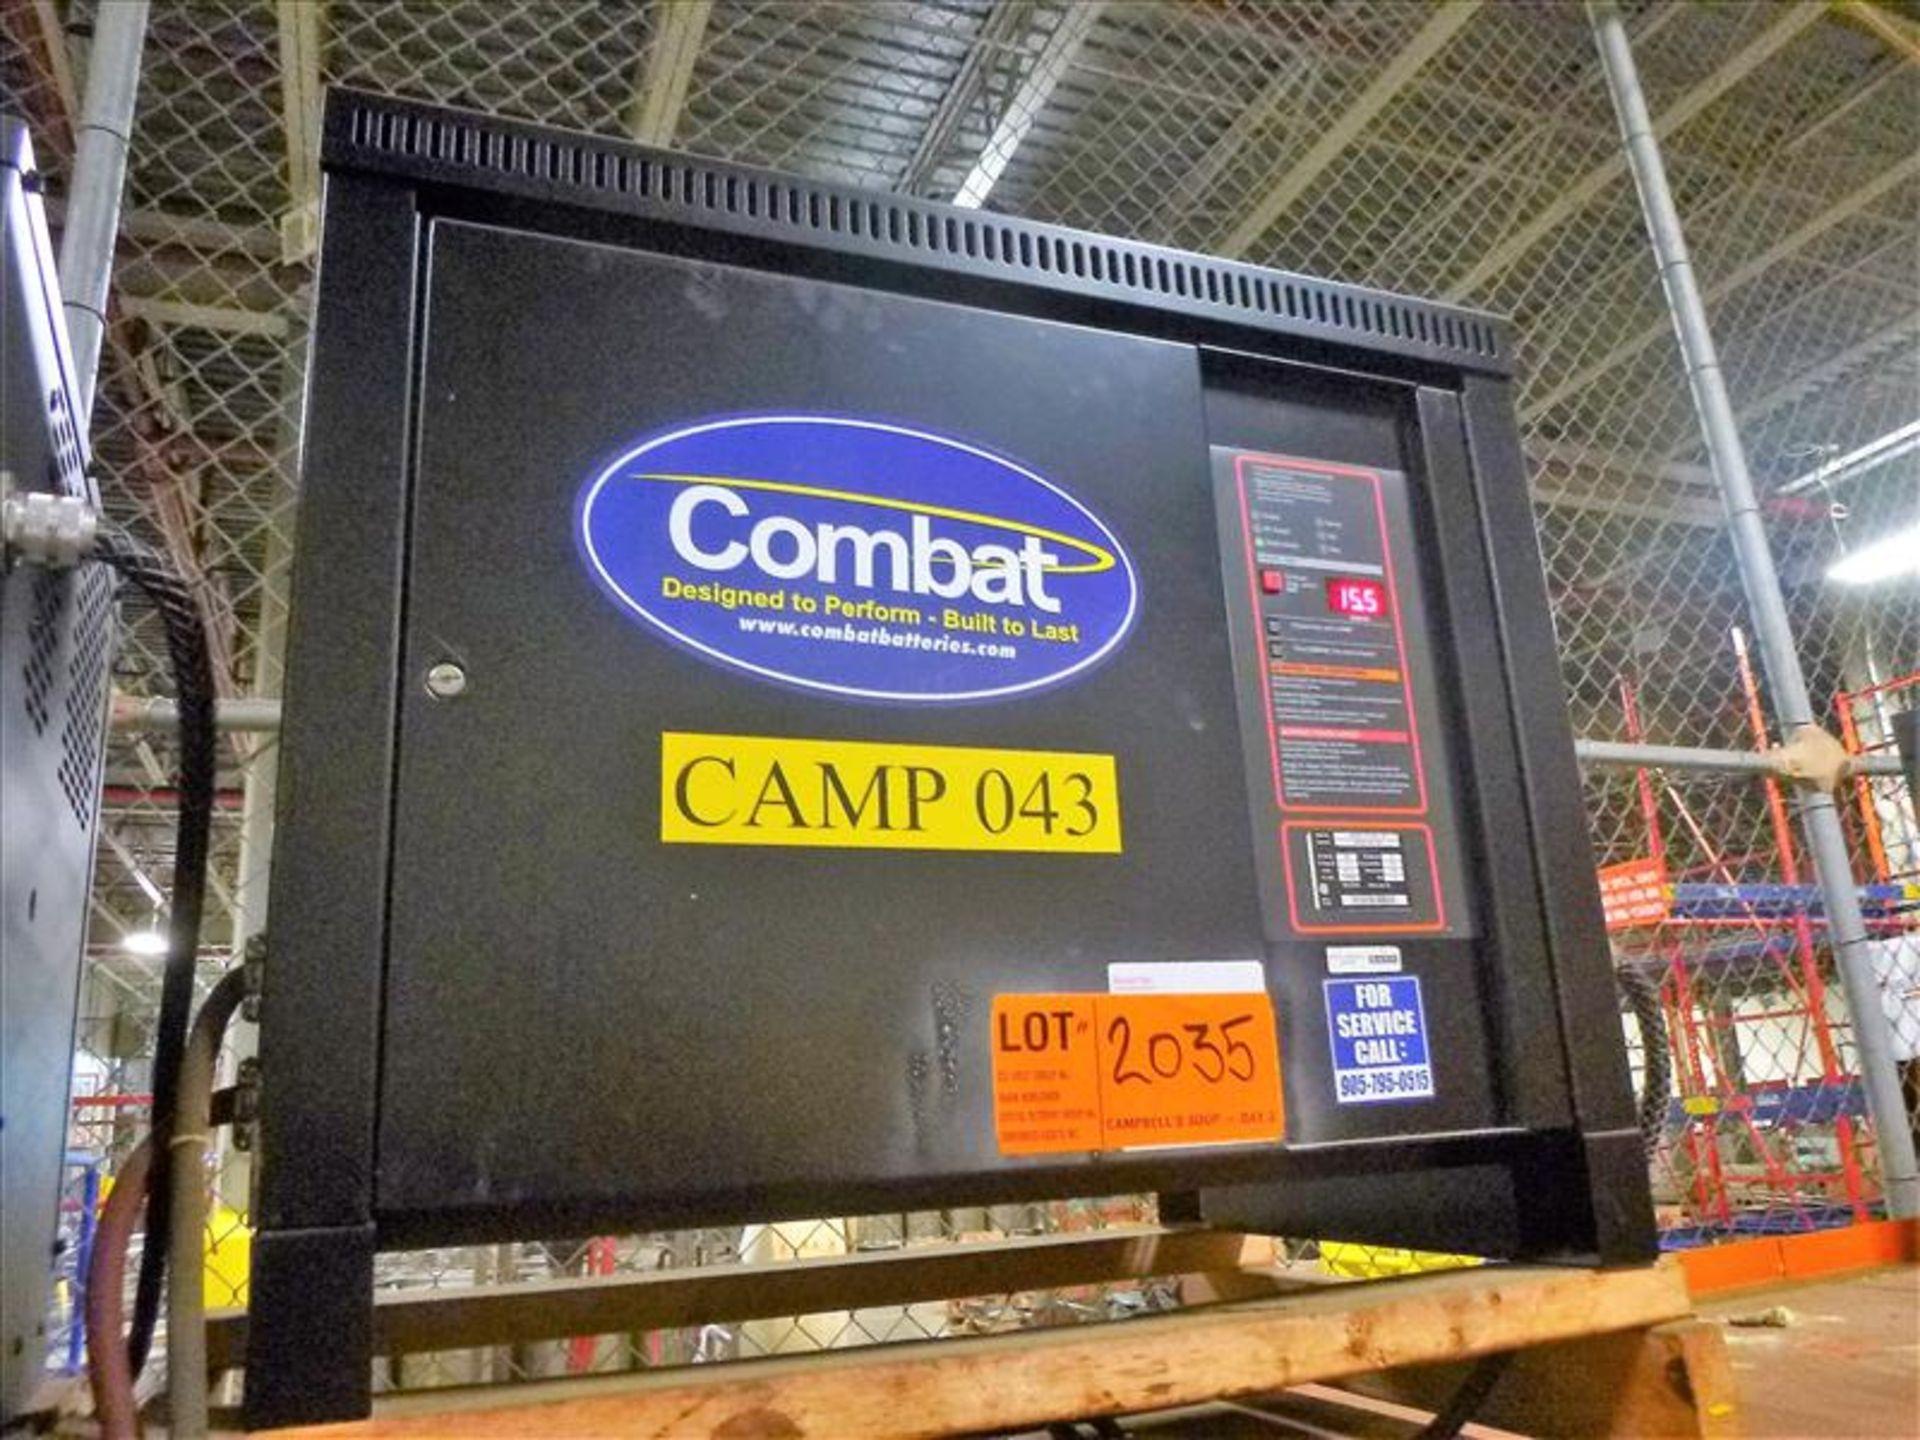 Lot 2035 - Combat battery charger, 48V [Material Handling]